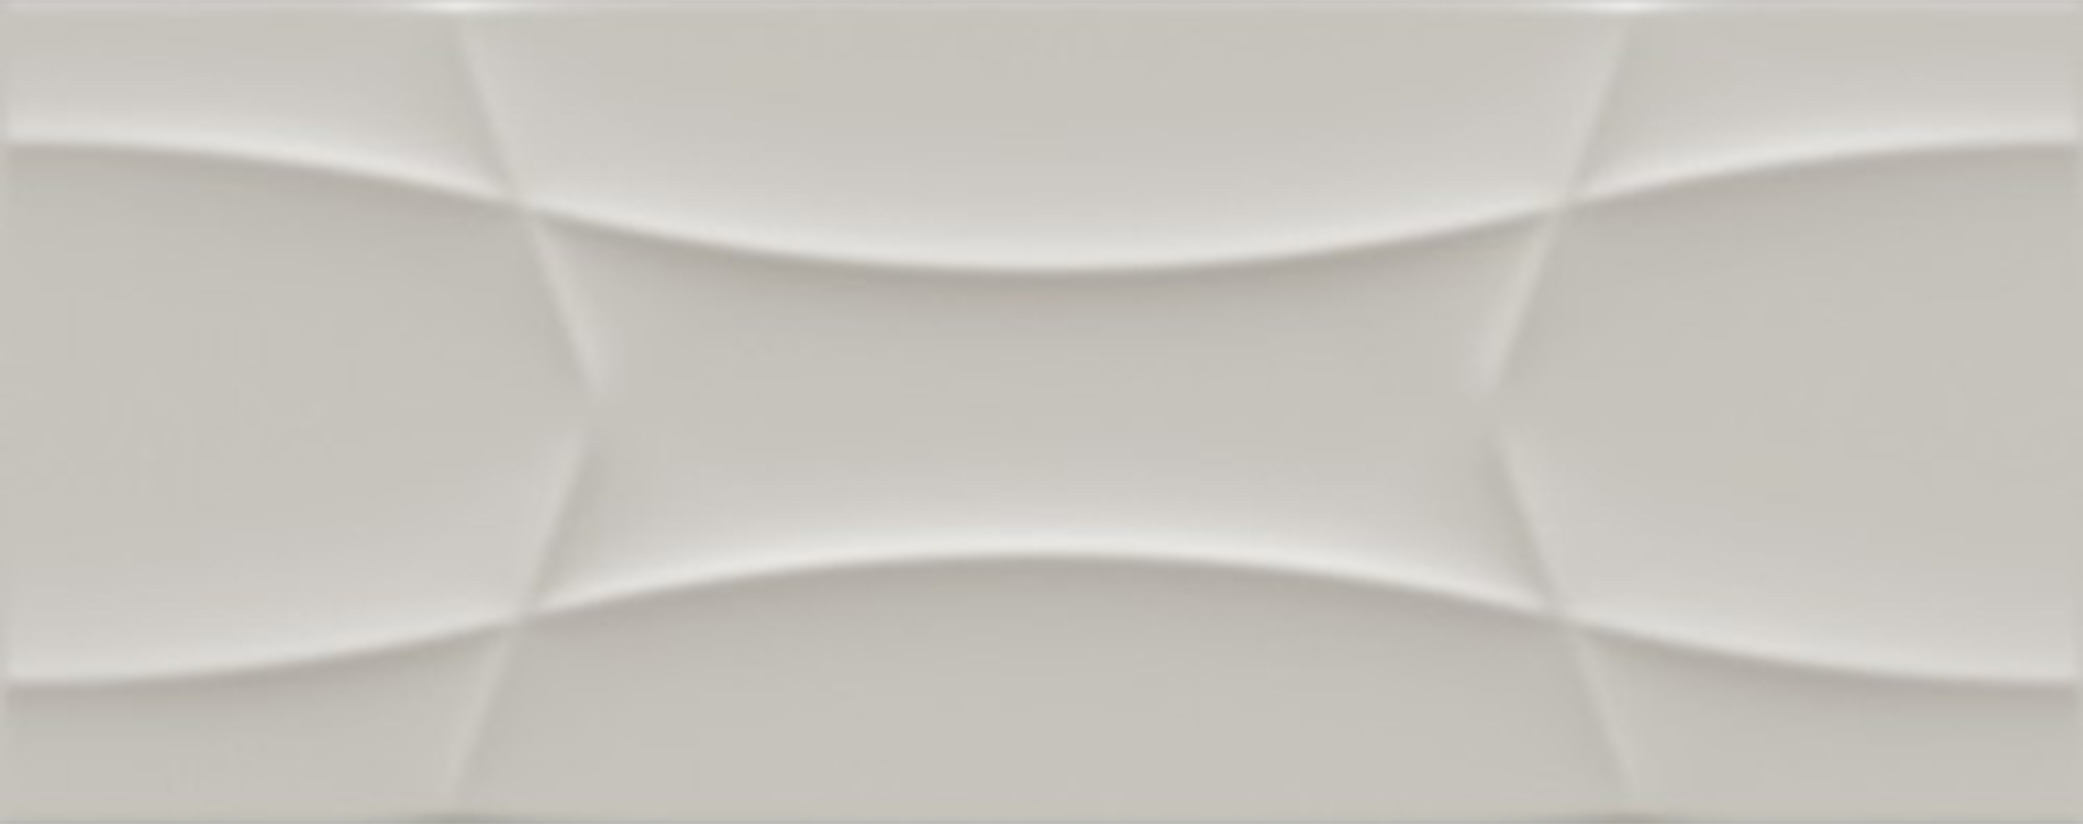 Decor Arrow Nova Gris Glossy 20 x 50